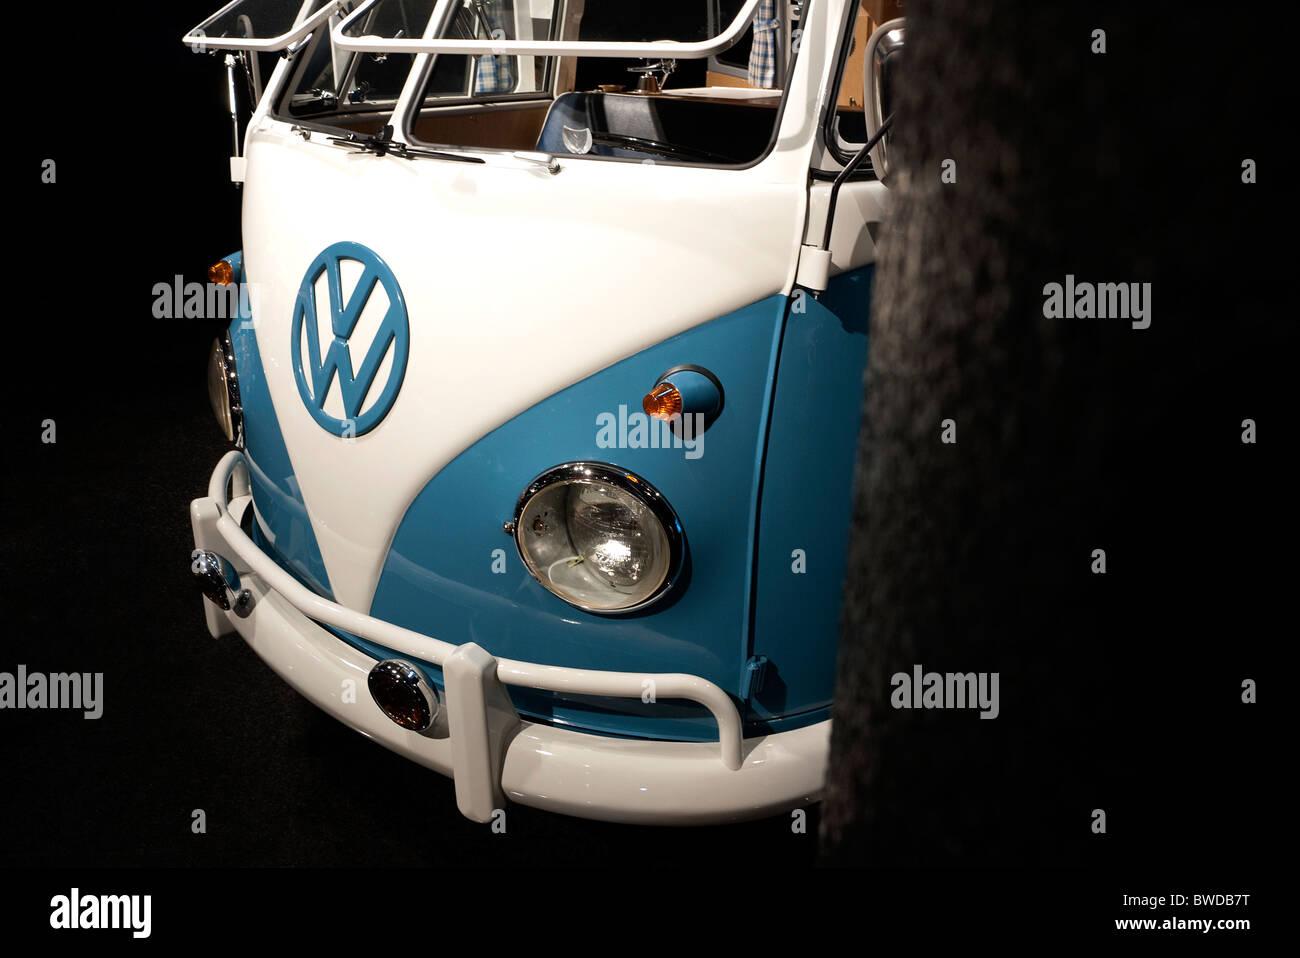 1961 VW Micro bus. - Stock Image